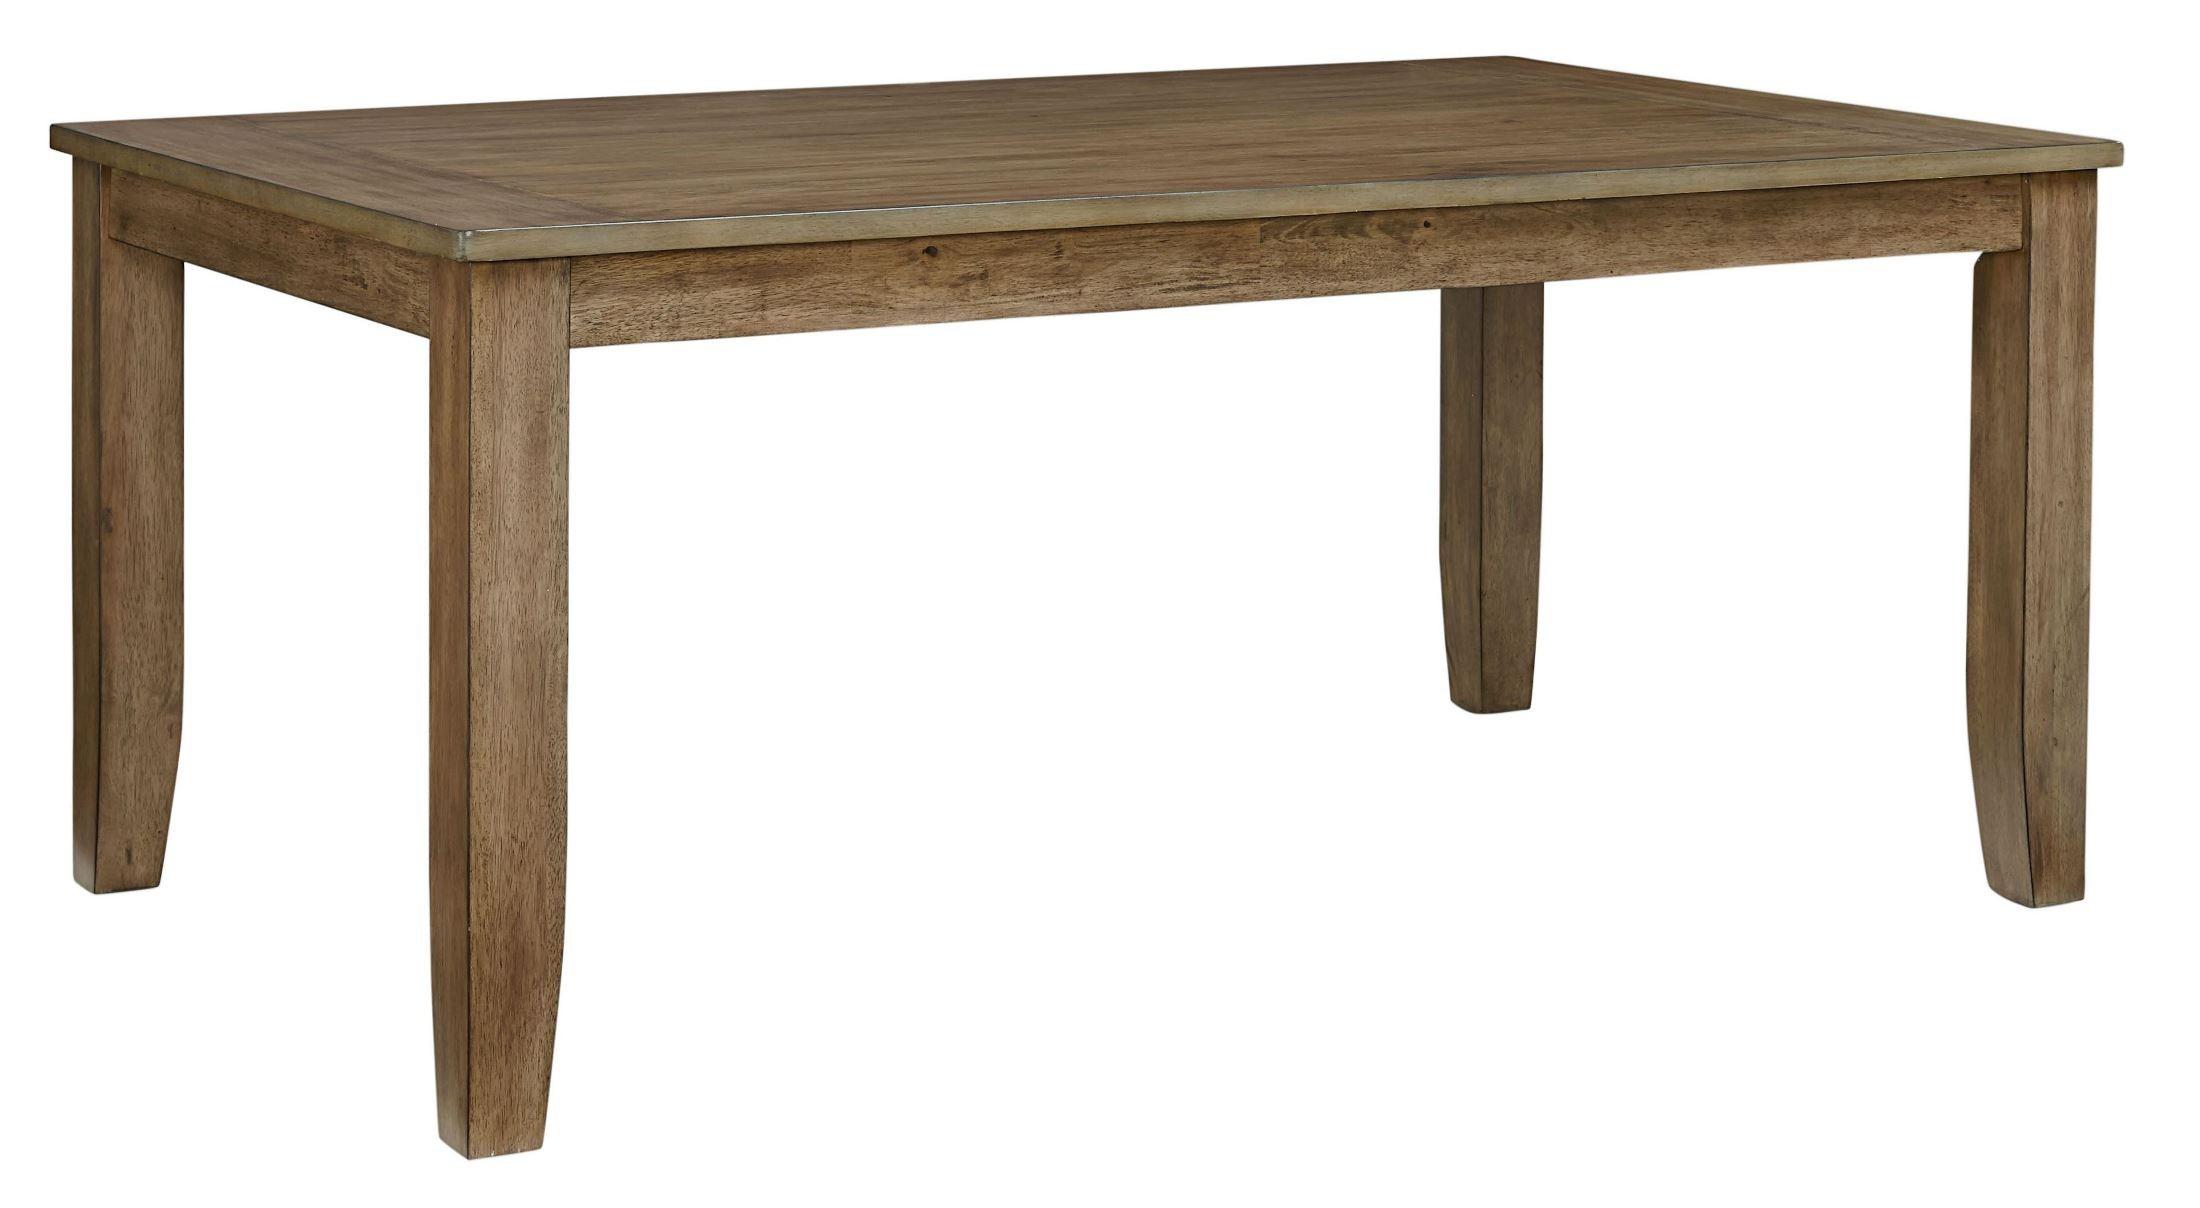 Vintage Weathered Grey Rectangular Leg Dining Table from  : 1130011306greytblsilo from colemanfurniture.com size 2200 x 1208 jpeg 197kB